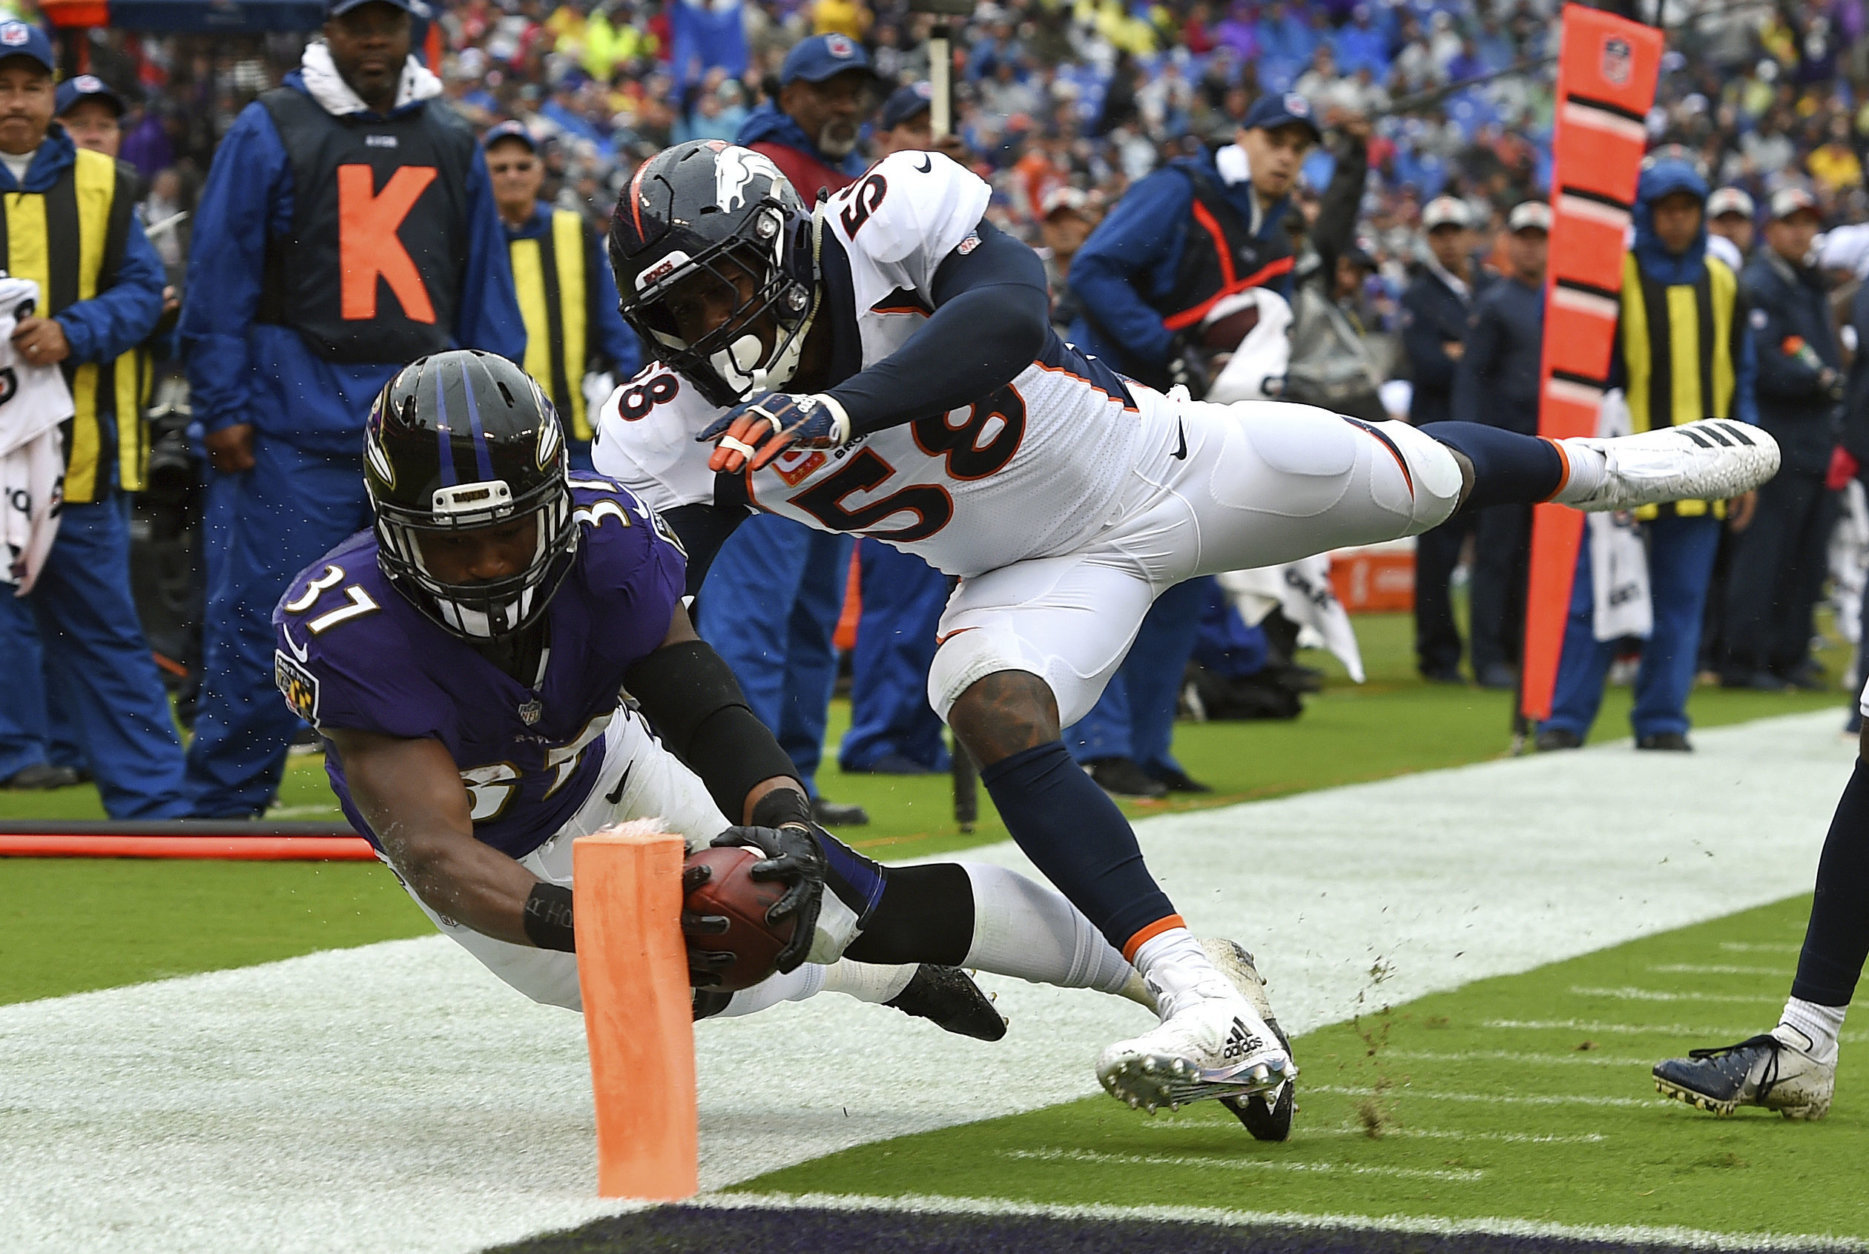 Baltimore Ravens running back Javorius Allen, left, scores a touchdown in front of Denver Broncos linebacker Von Miller in the first half of an NFL football game, Sunday, Sept. 23, 2018, in Baltimore. (AP Photo/Gail Burton)